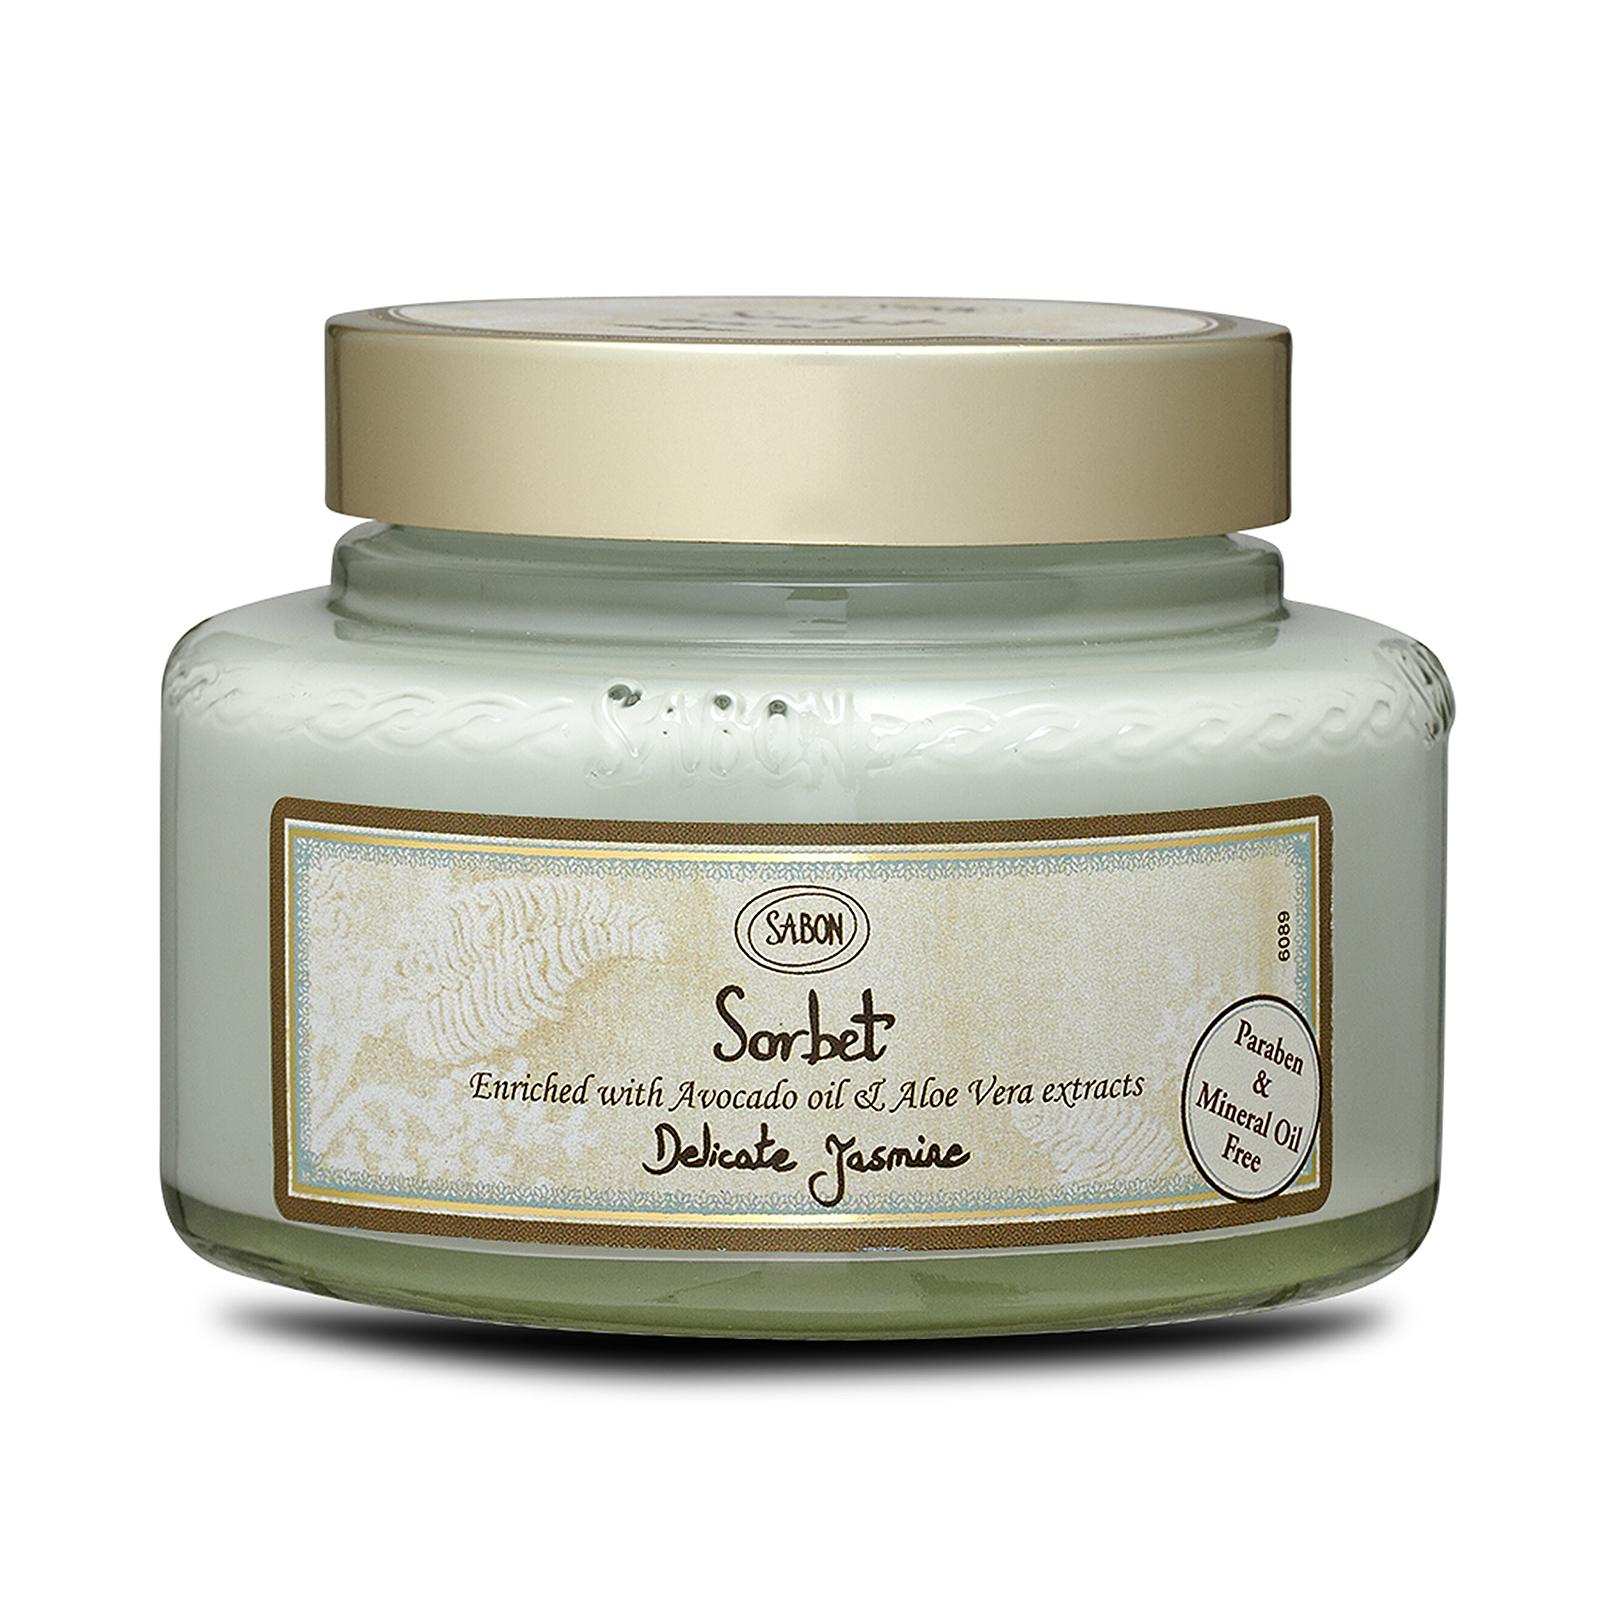 Sabon  Sorbet Body Gel Delicate Jasmine, 7oz, 200ml